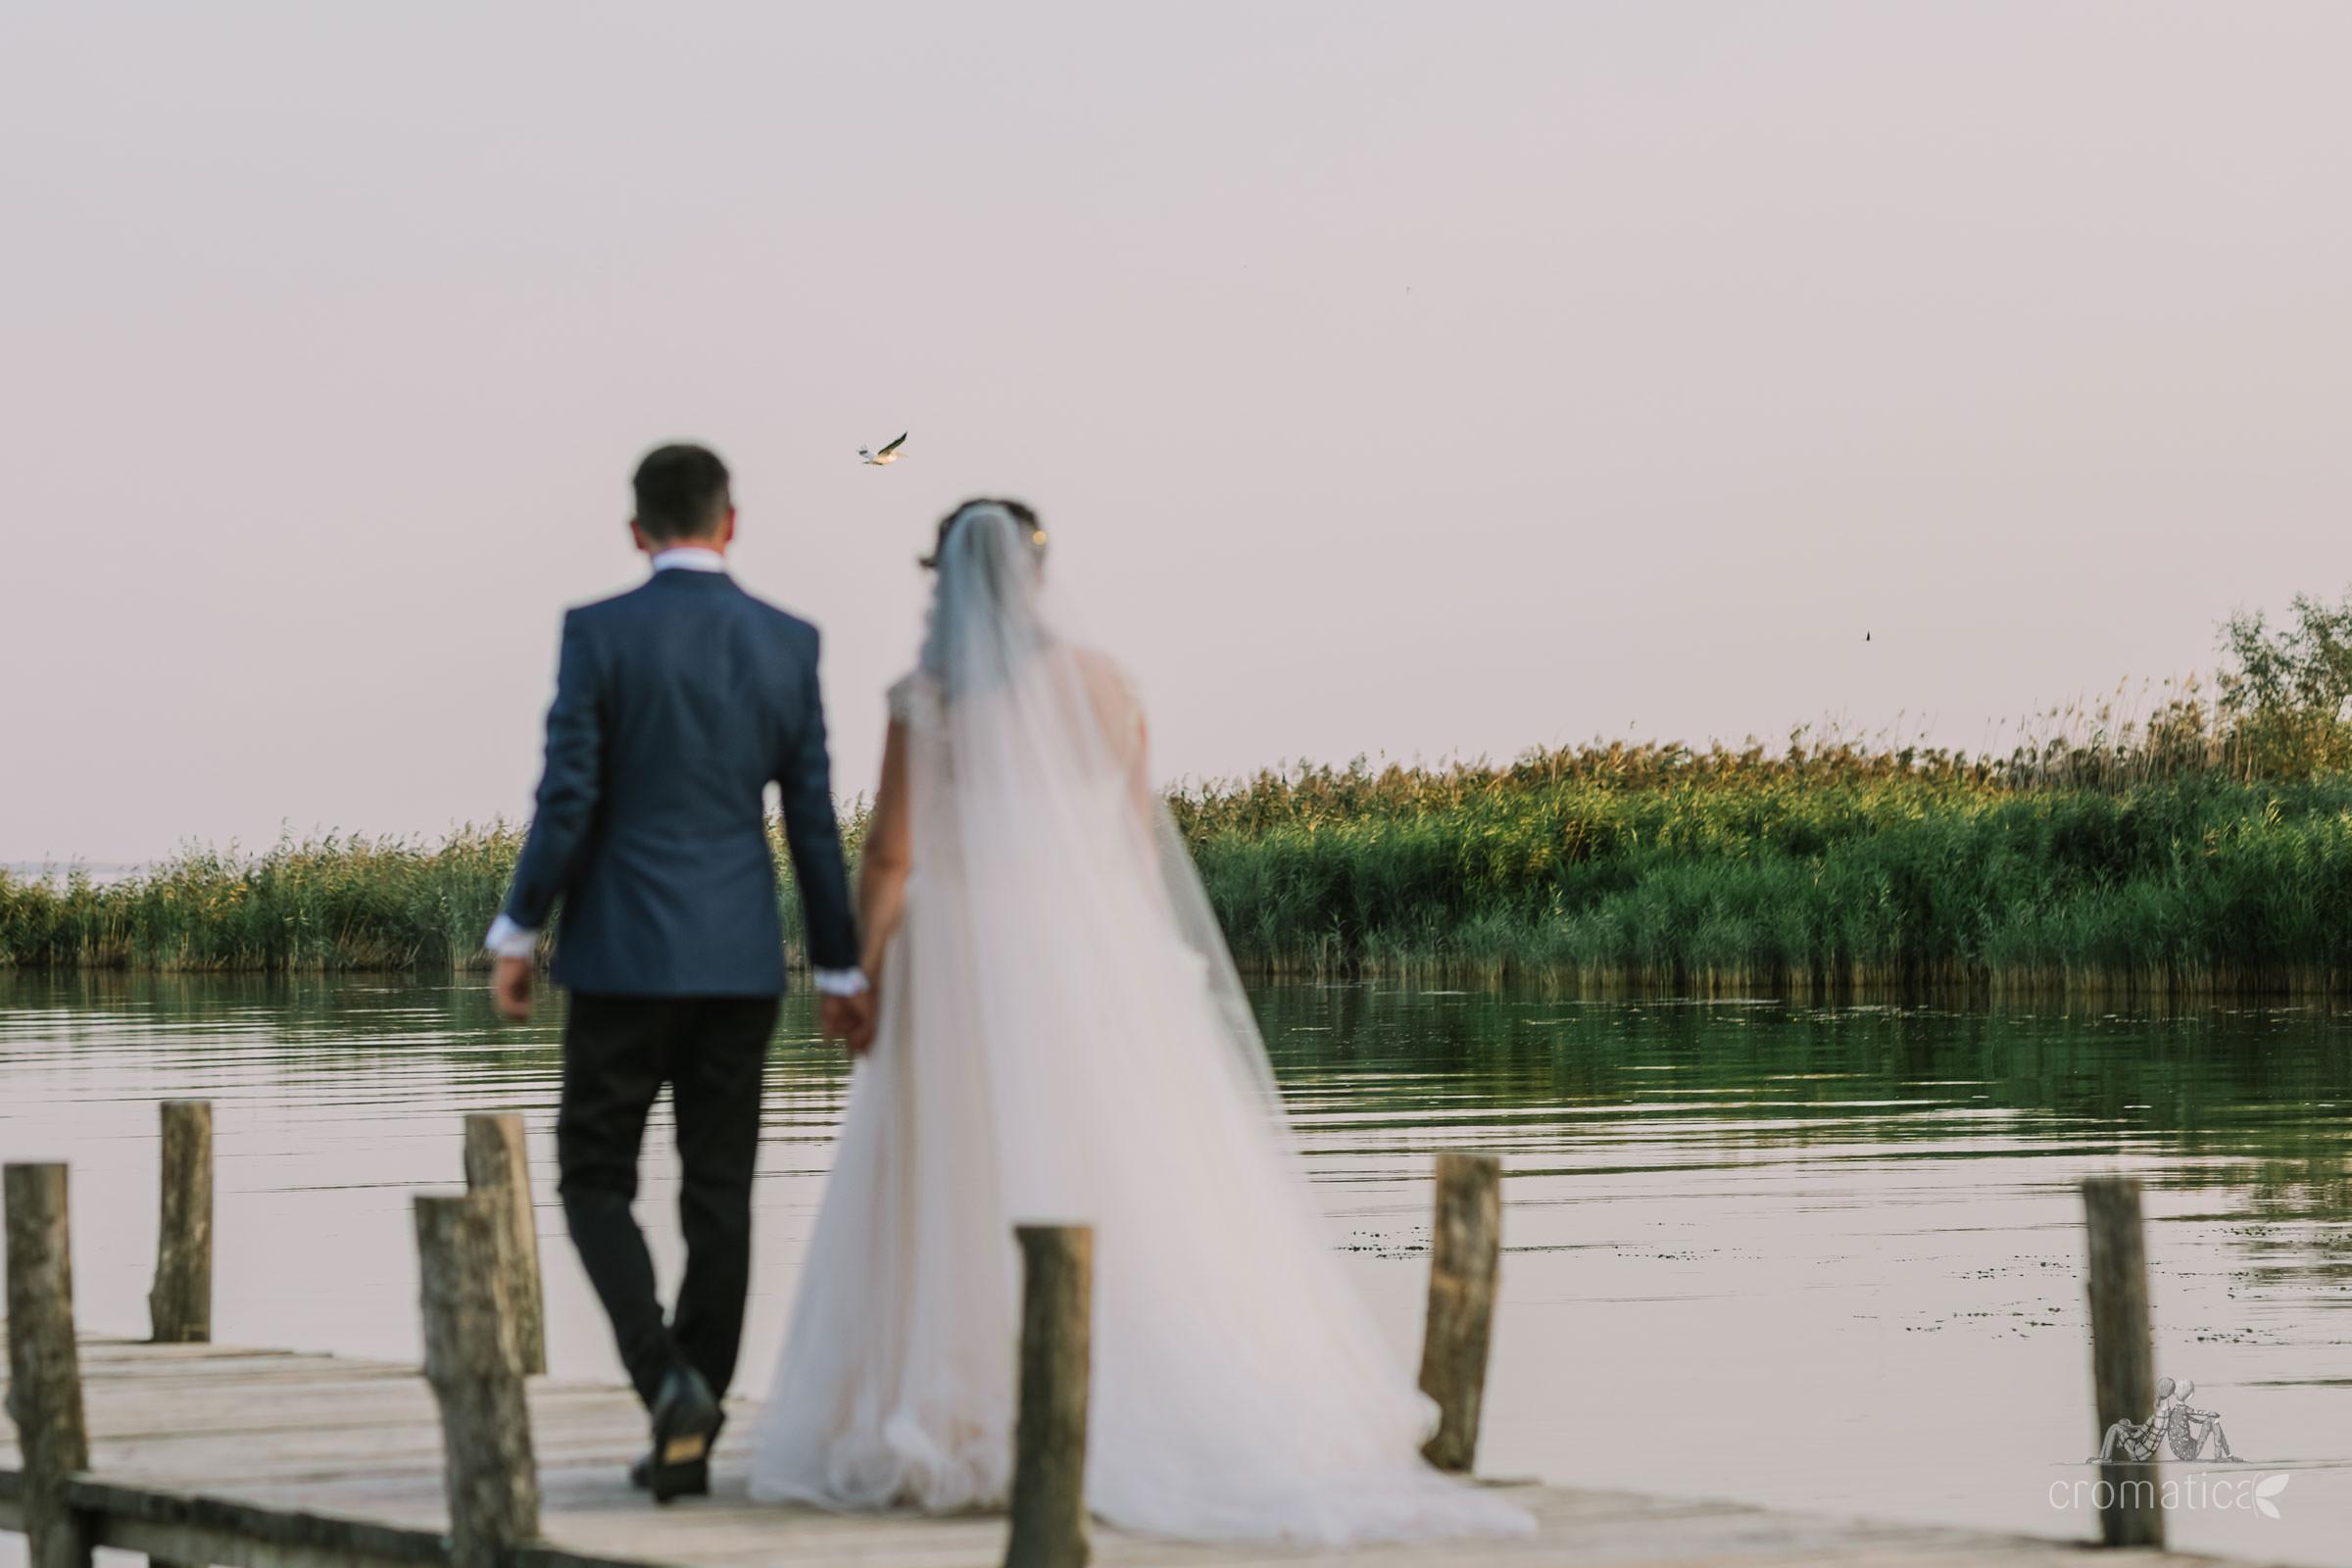 giorgiana constantin fotografii nunta delta royal delta dunarii 047